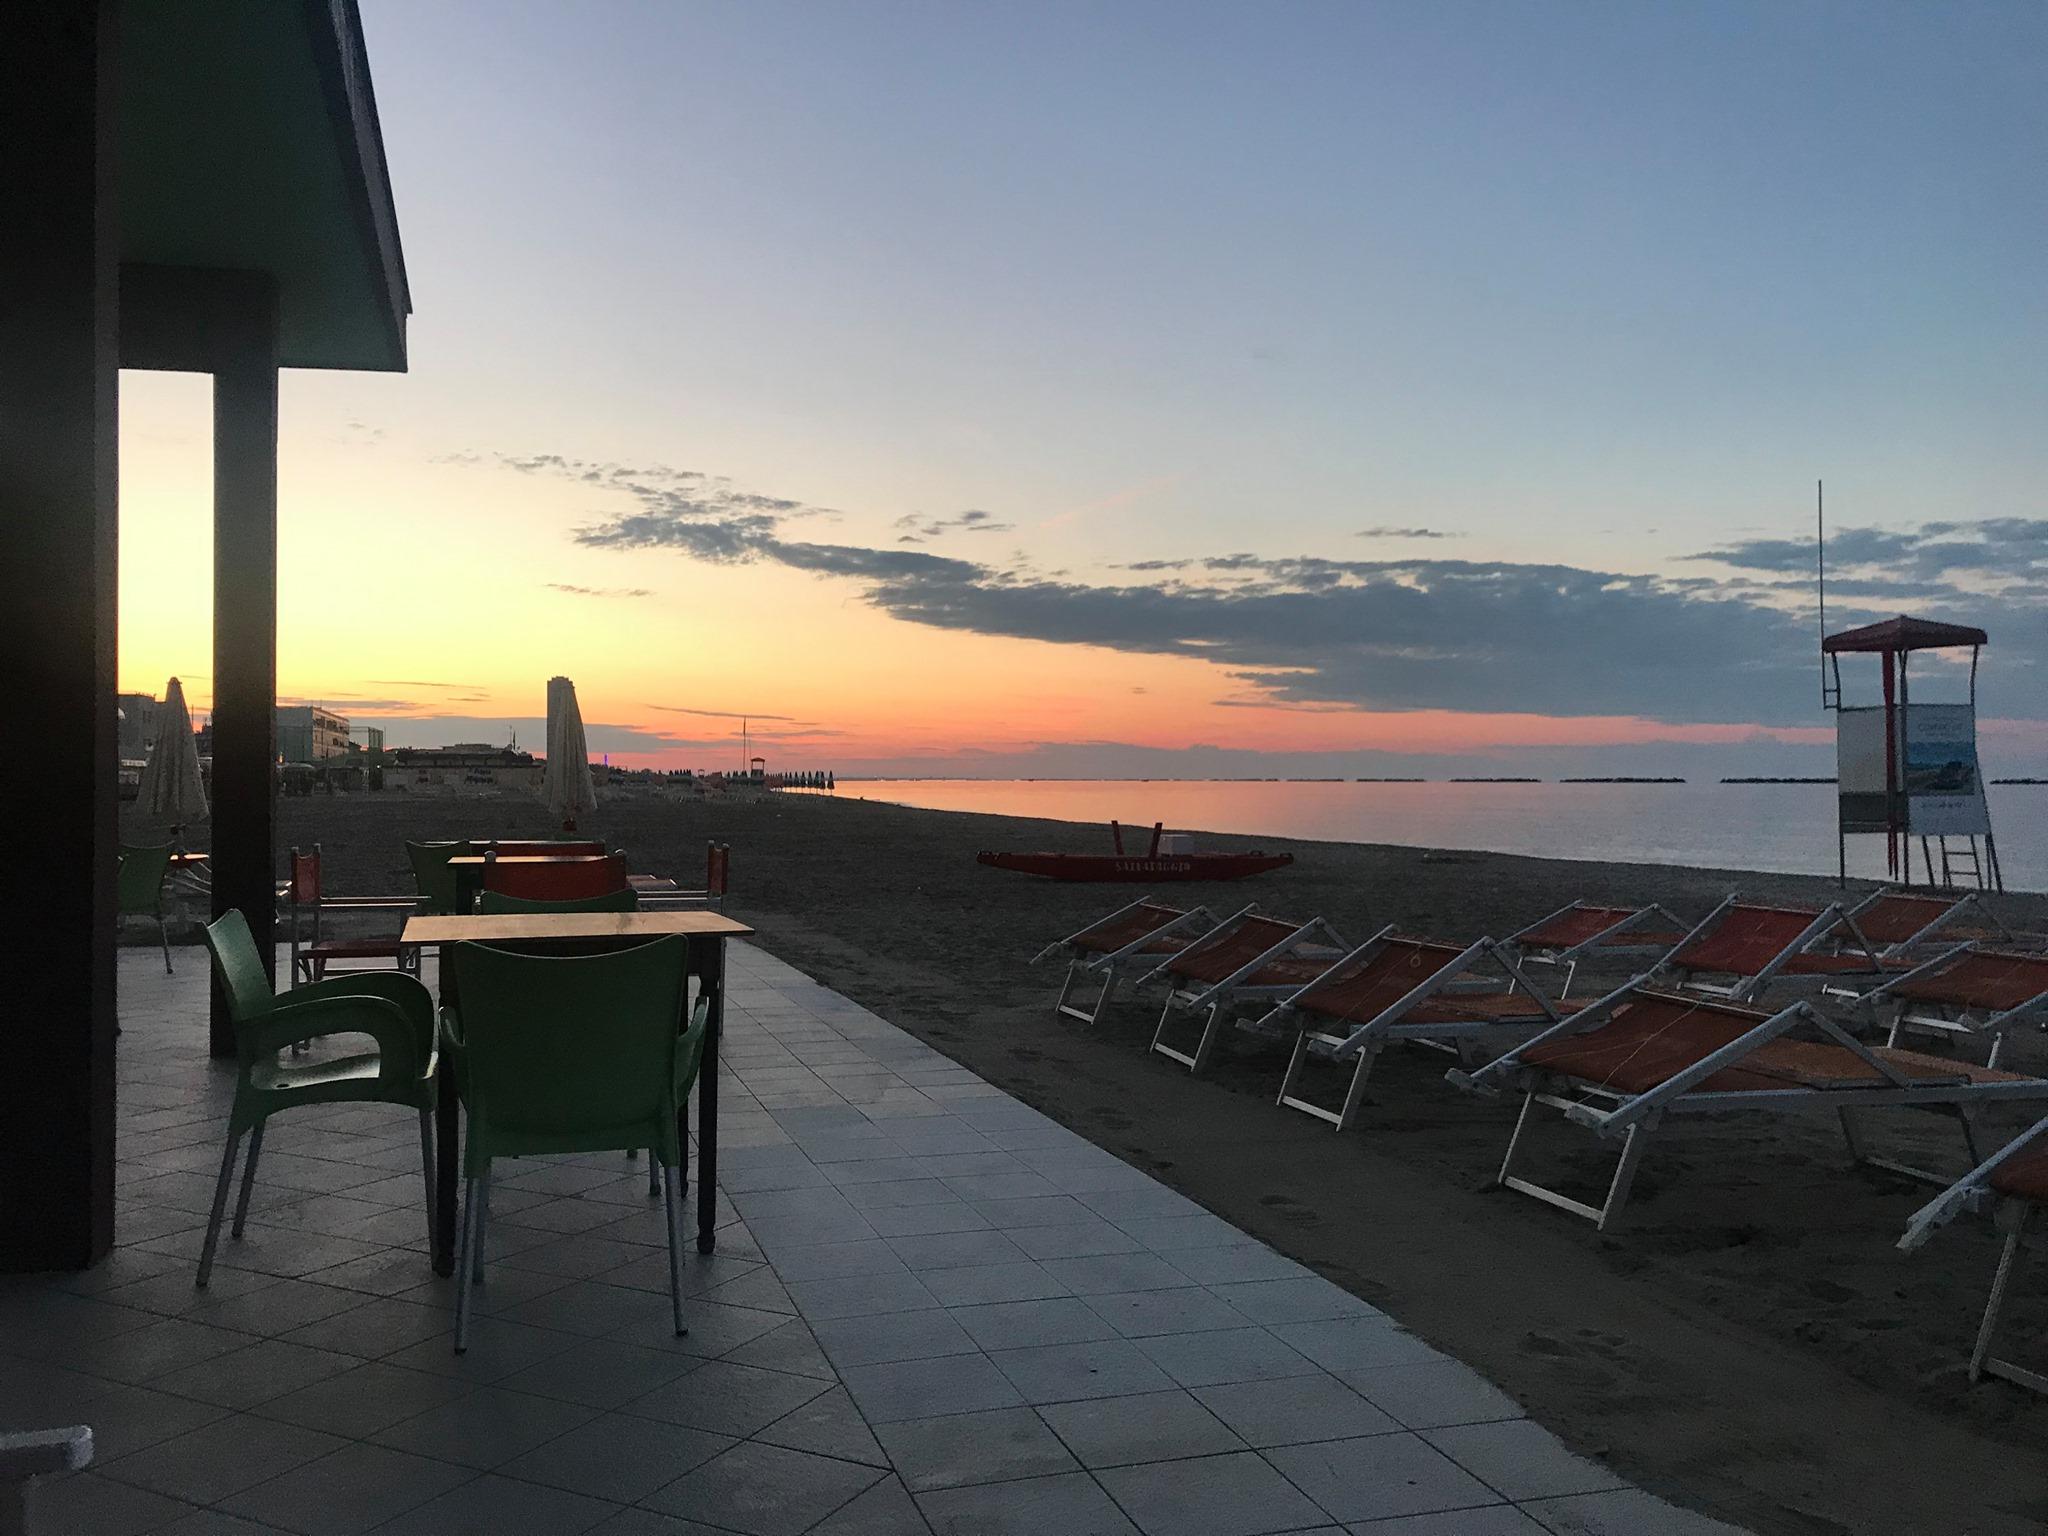 Spiaggia 18 Valverde - Casa dei Romagnoli